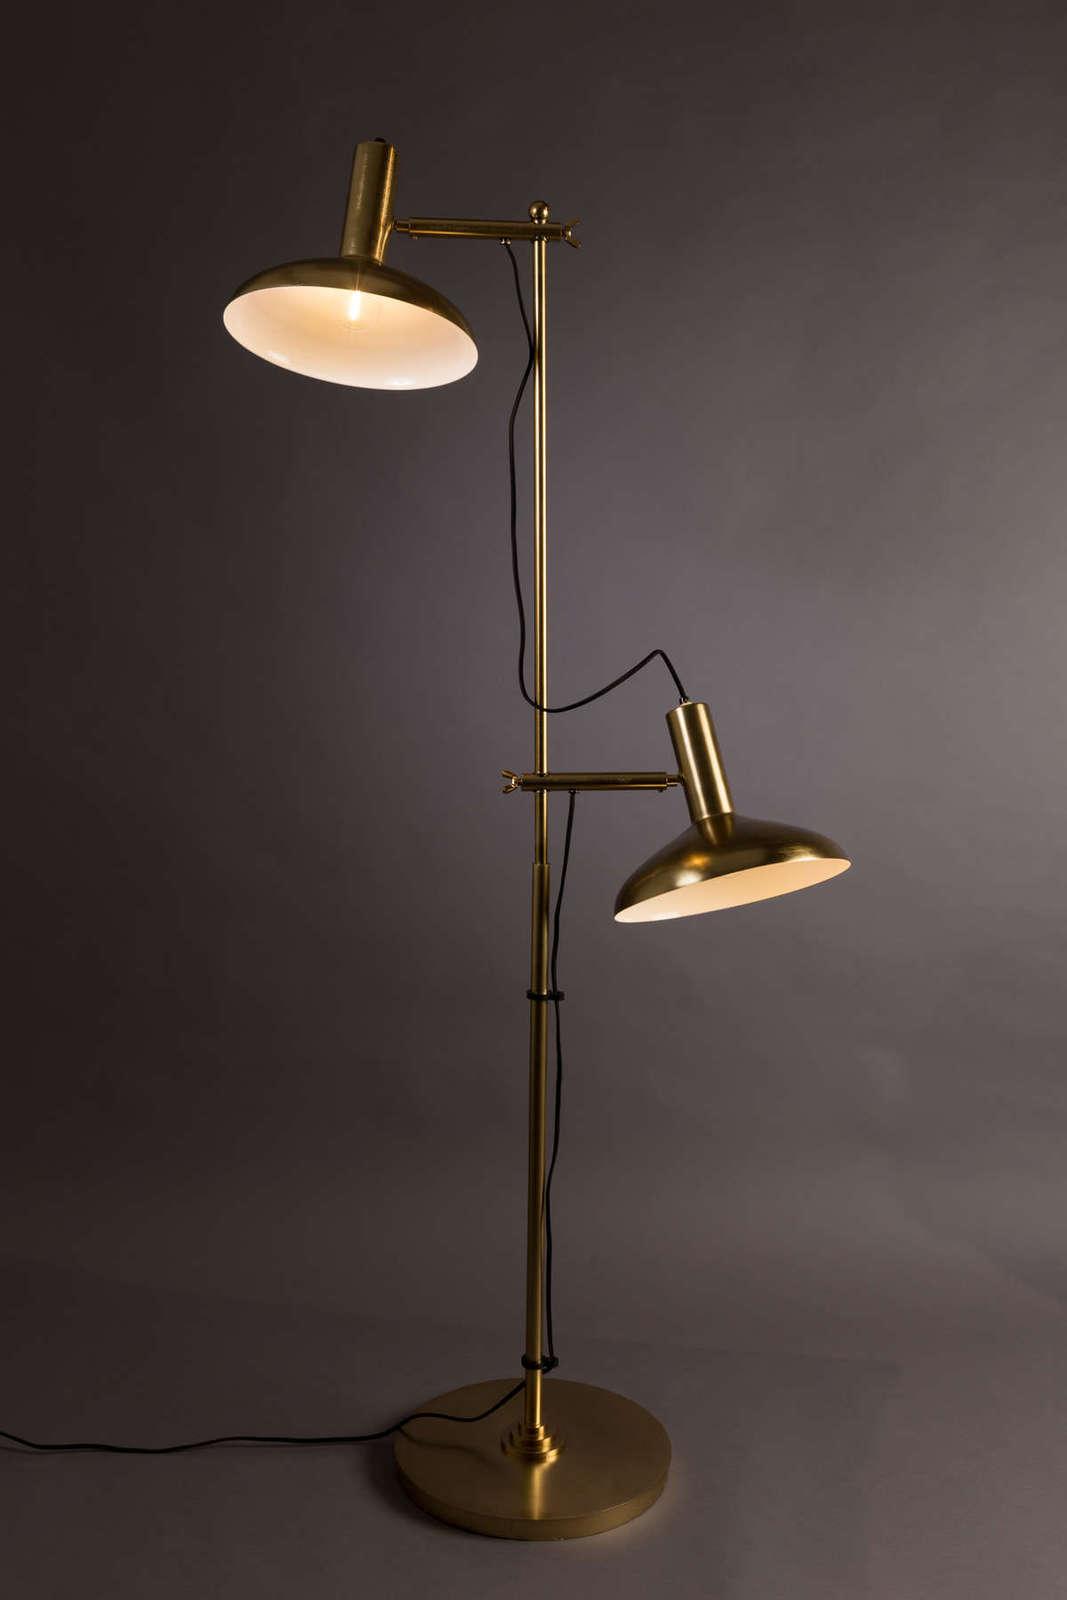 Lampa podłogowa Karish